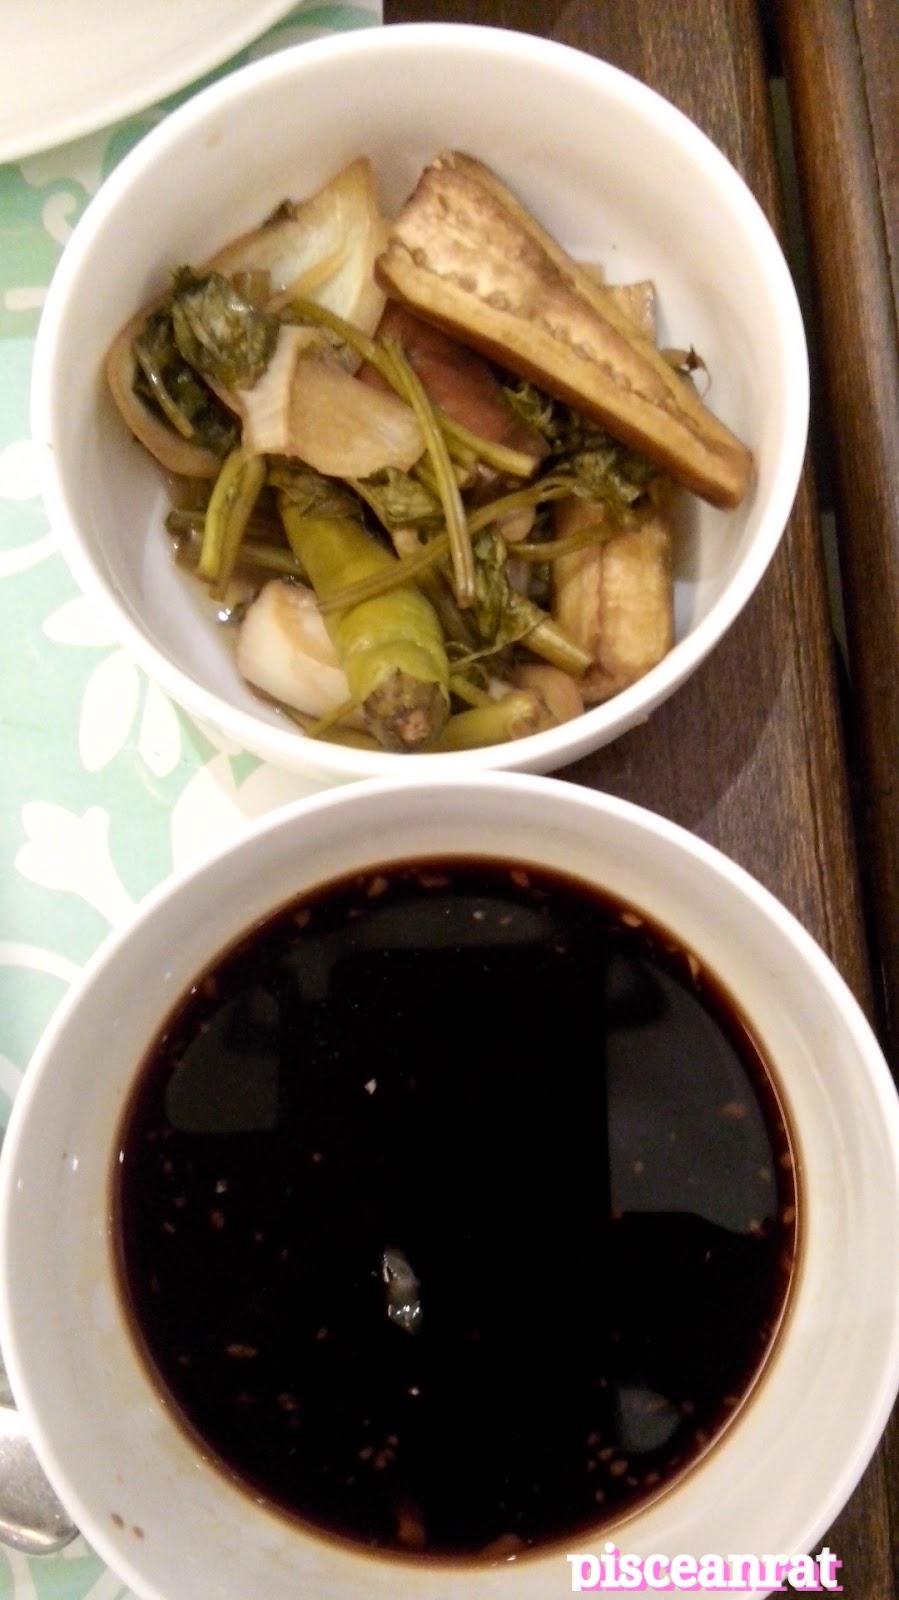 food blog philippines, food blogger philippines, pisceanrat,